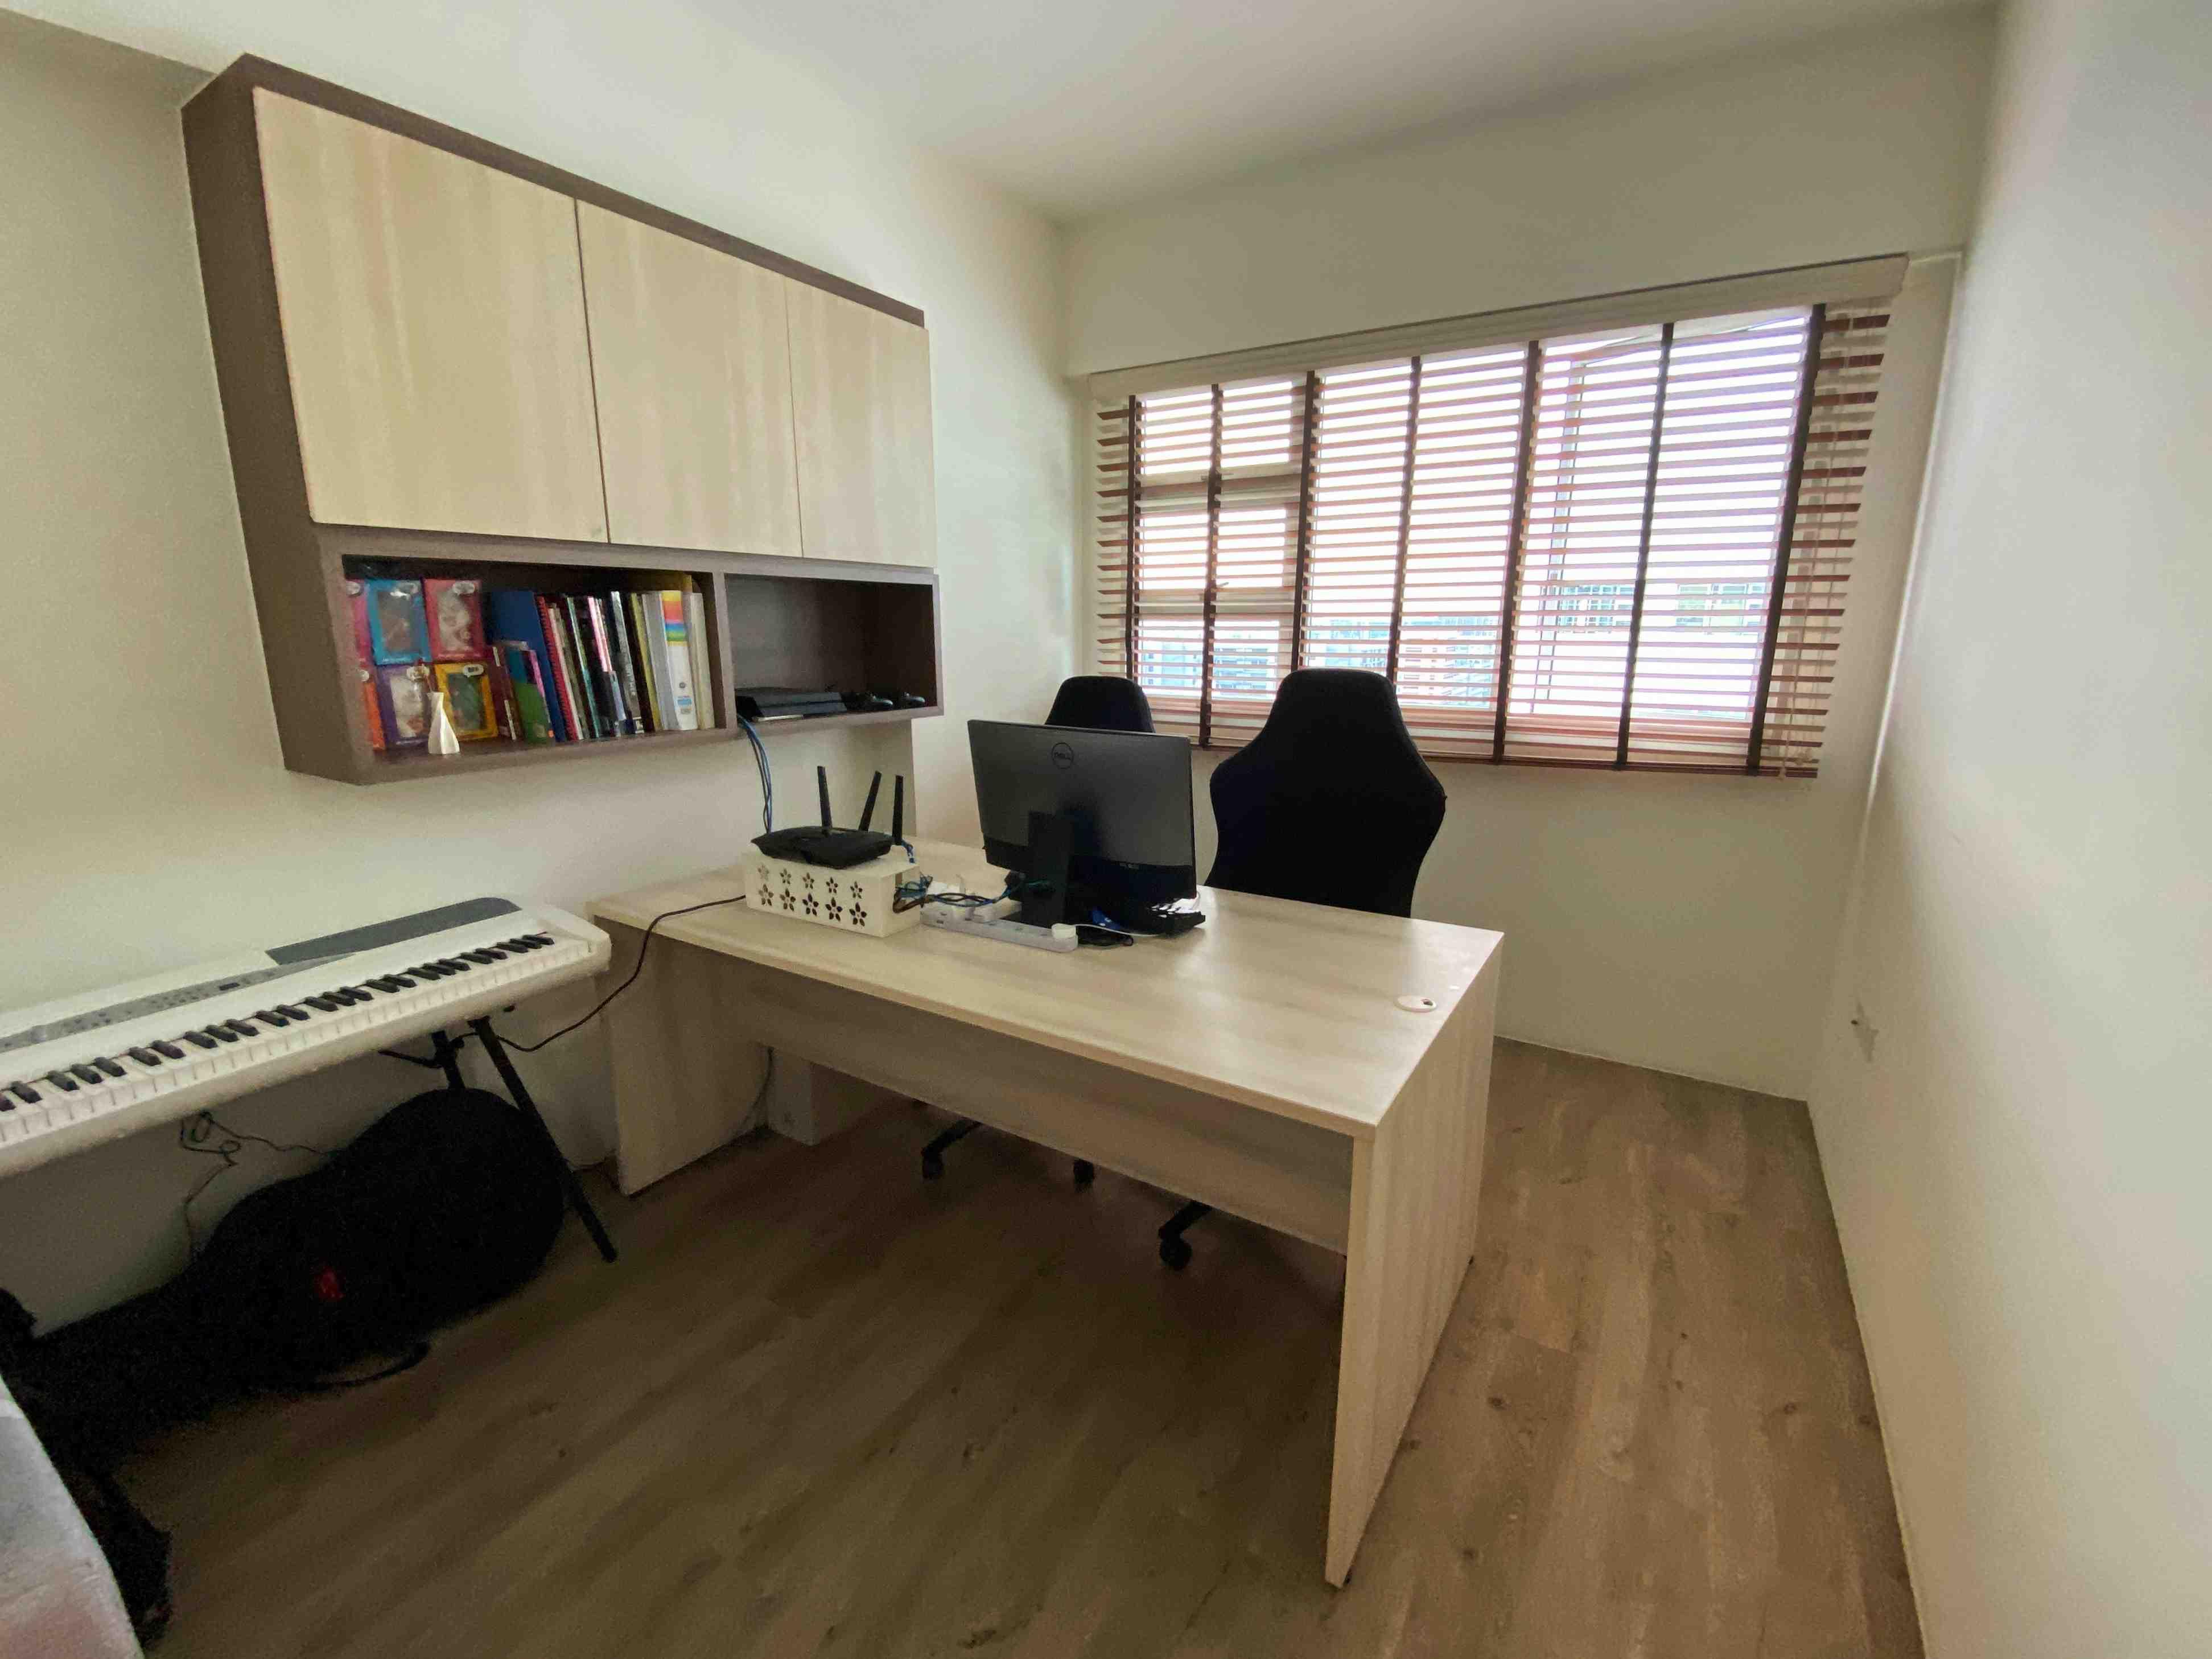 4 study room